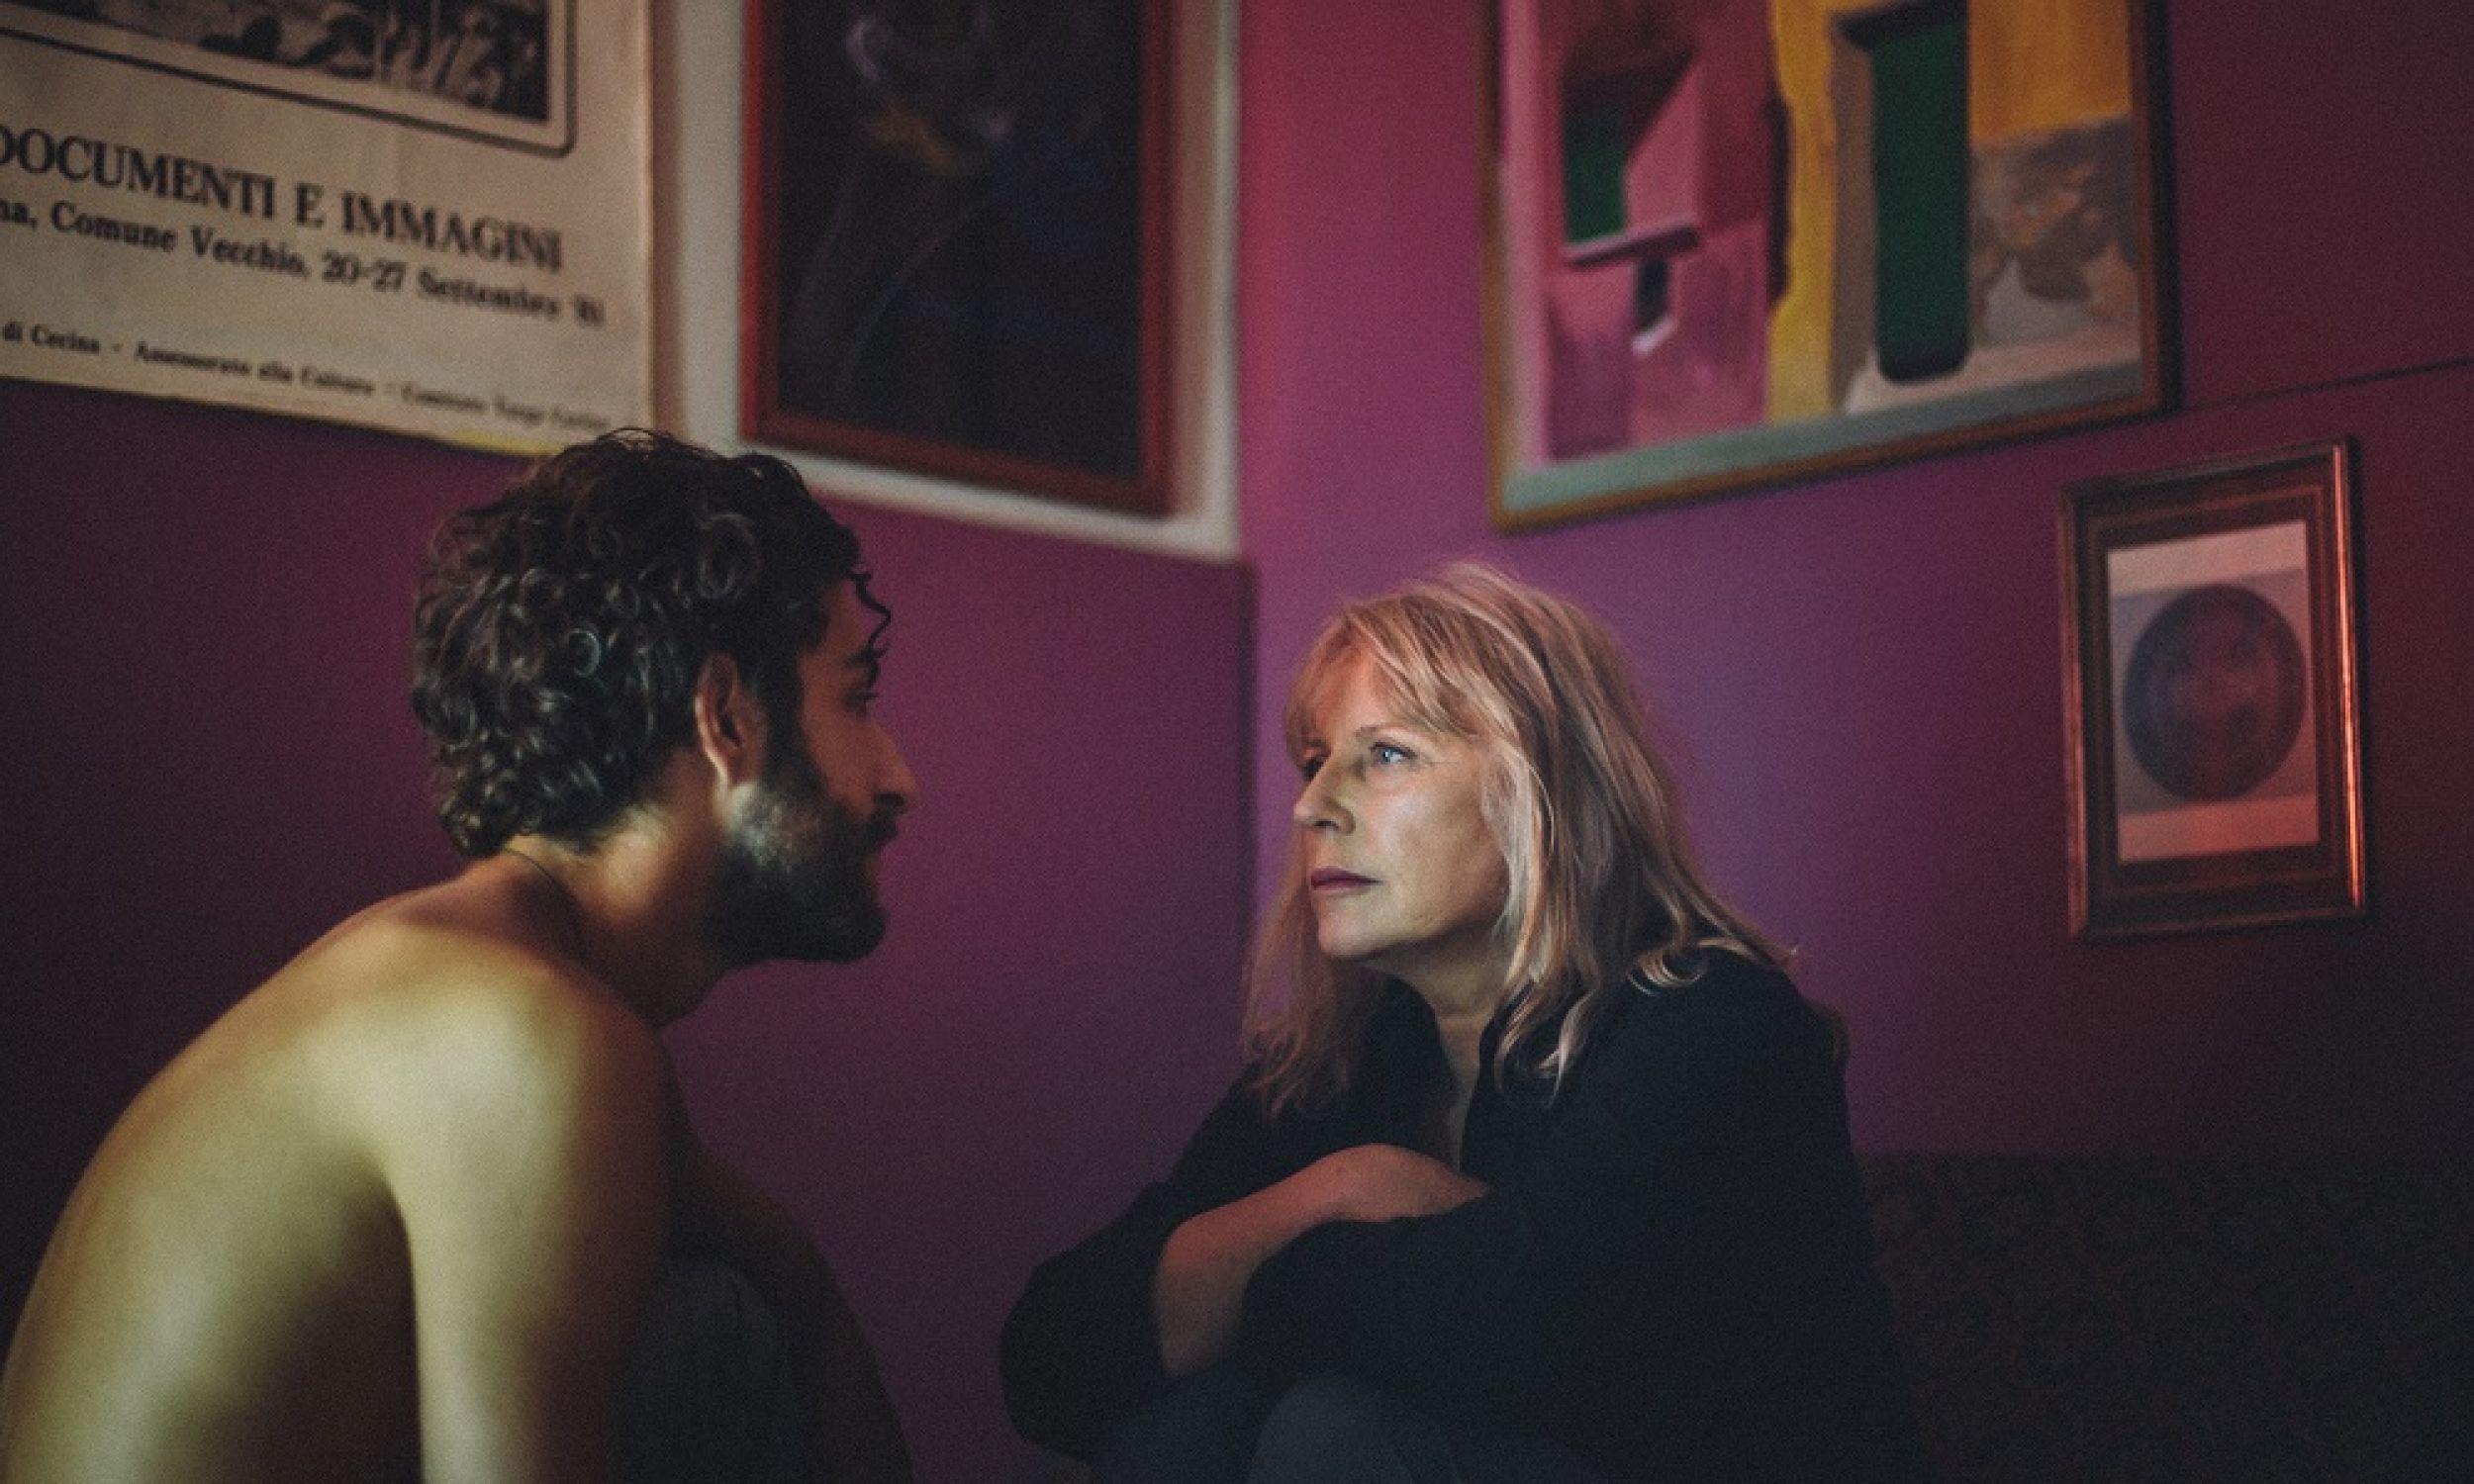 Lorenzo de Moor i Krystyna Janda. Fot. Next film